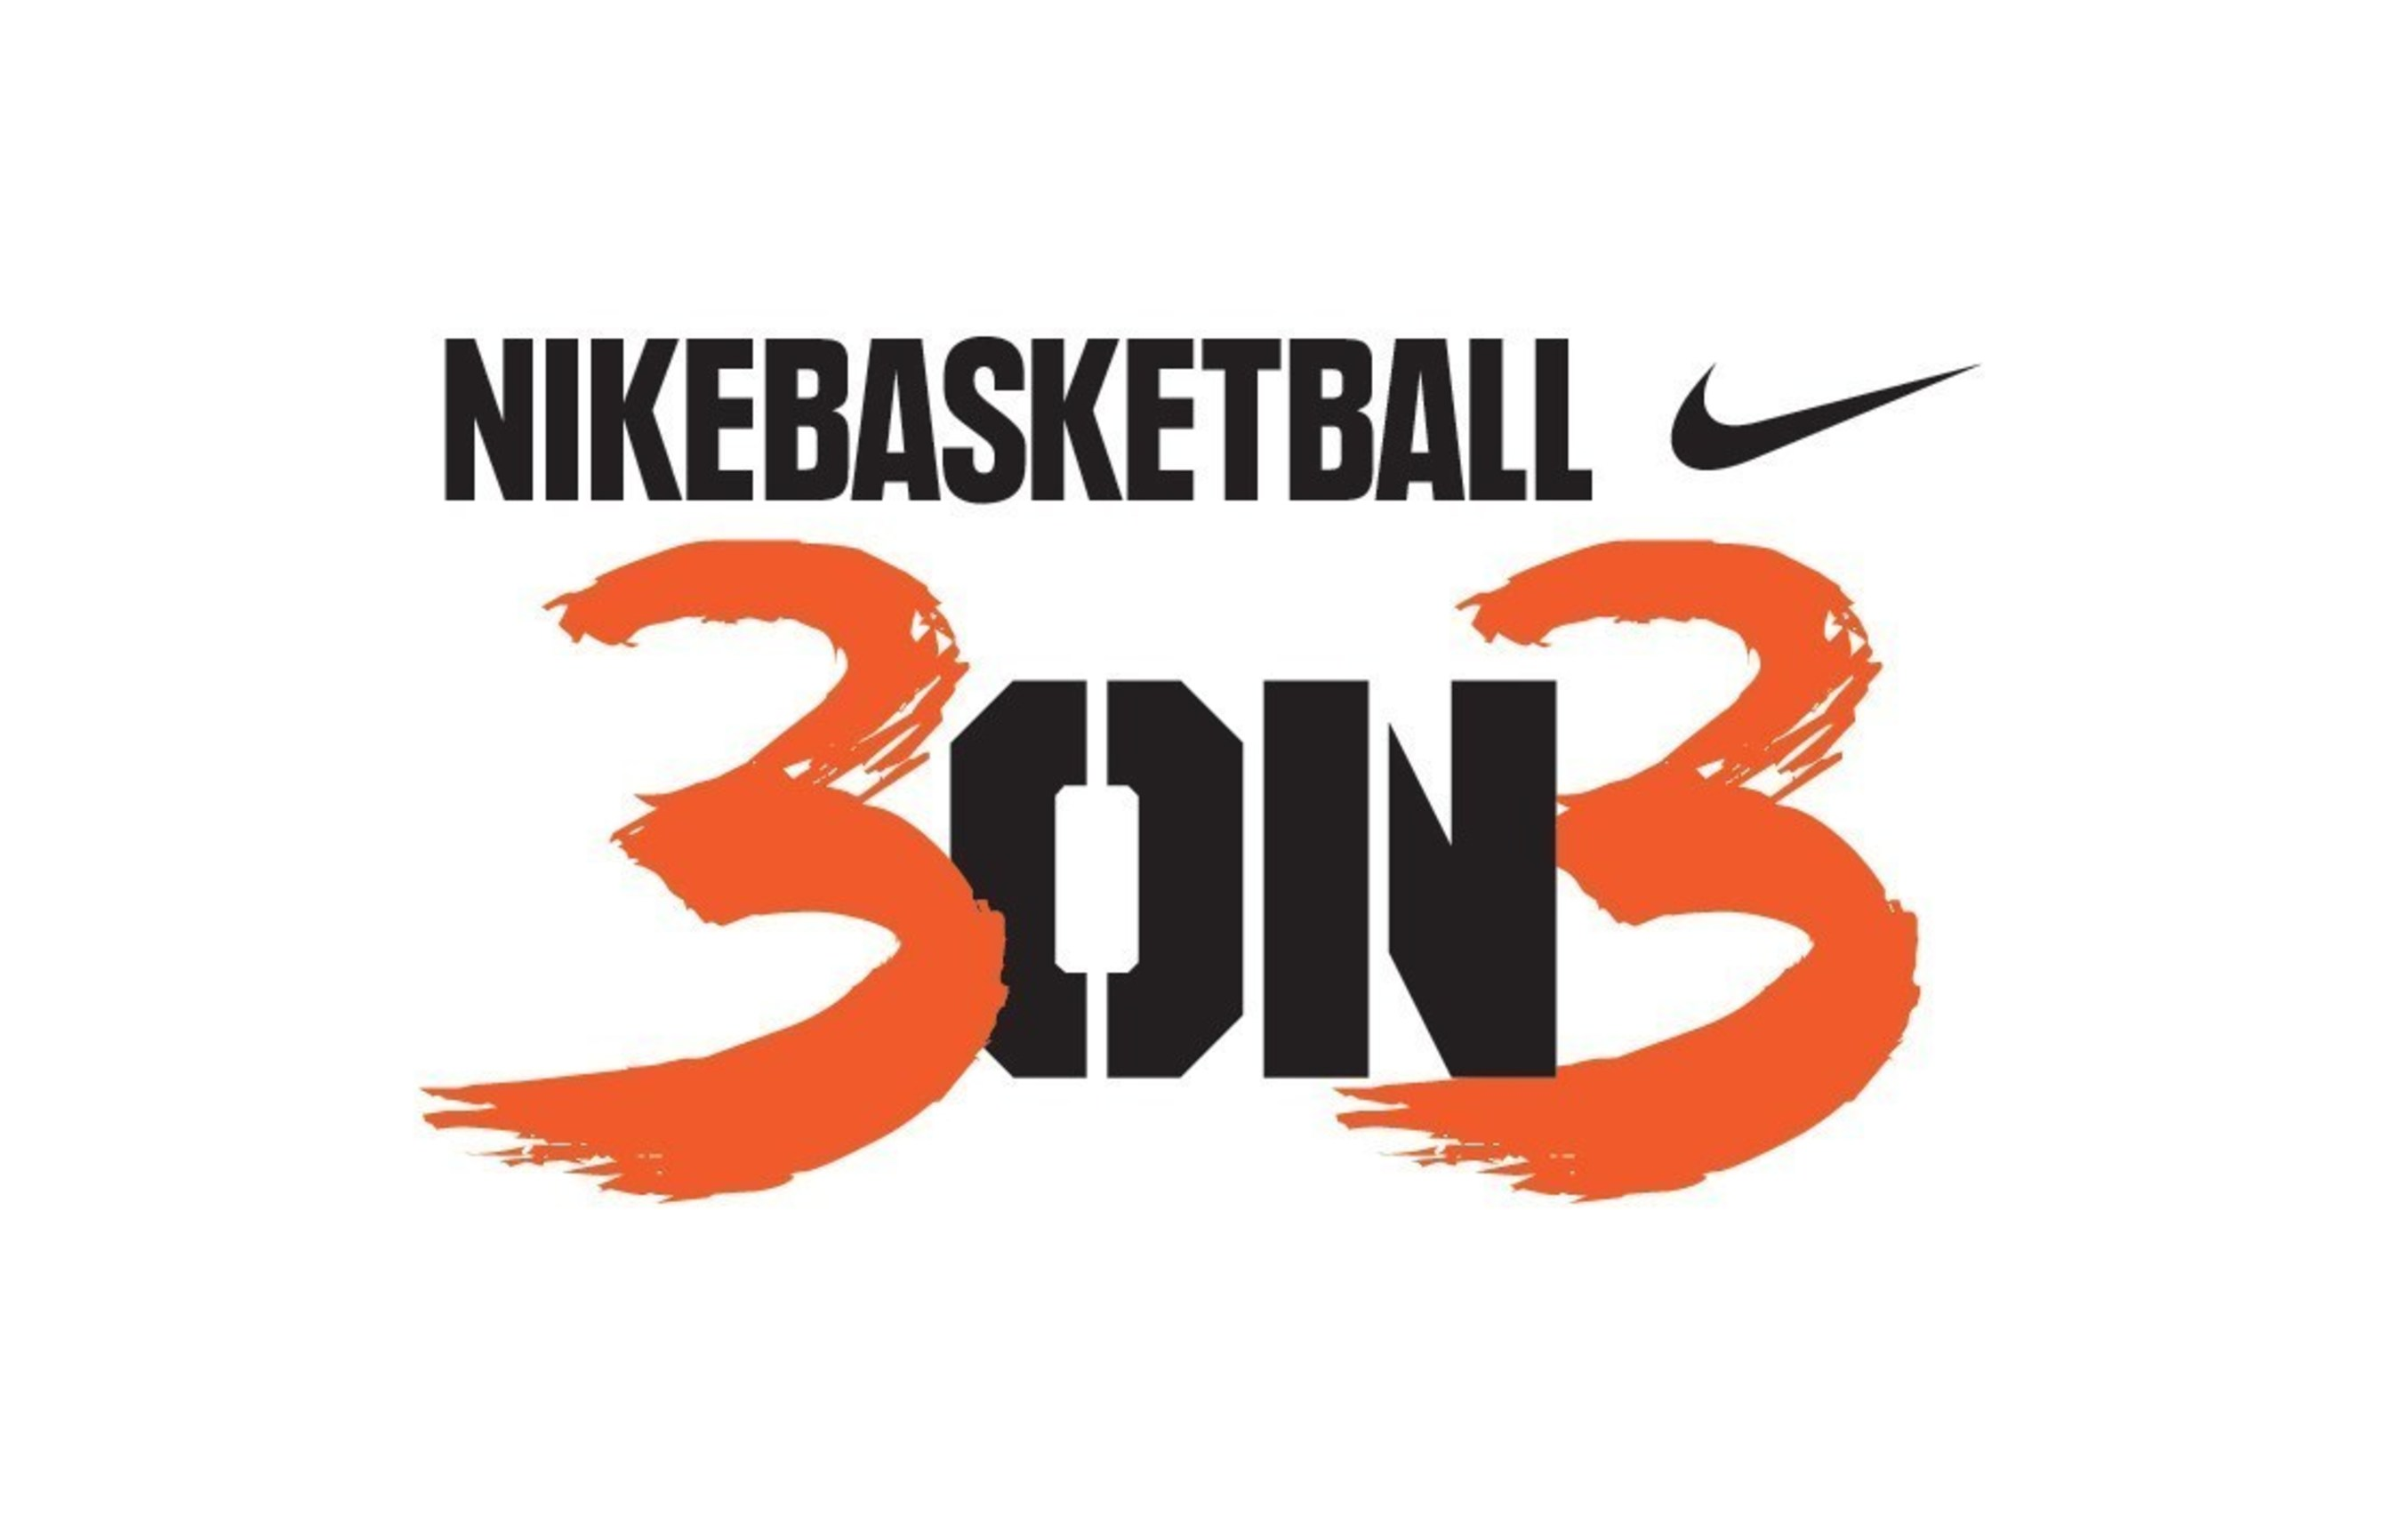 Nike 3on3 prizes